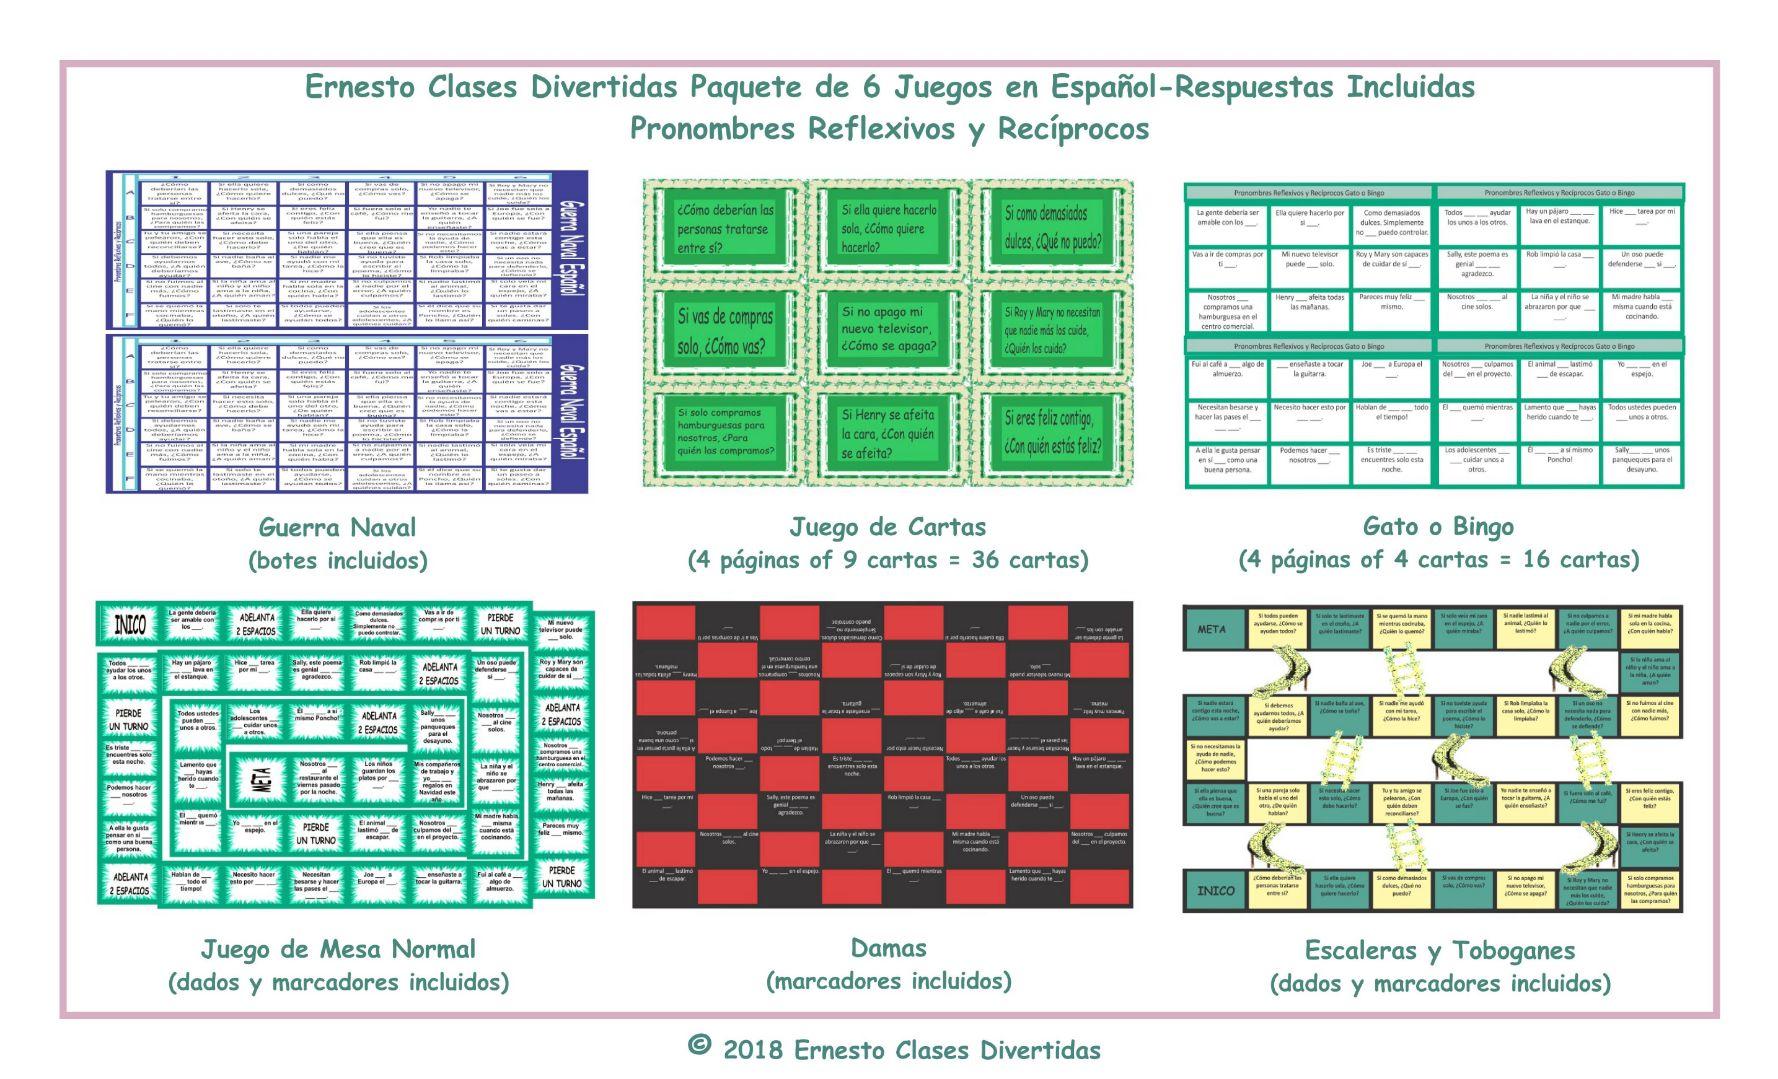 Reflexive and Reciprocal Pronouns 6 Spanish Game Bundle